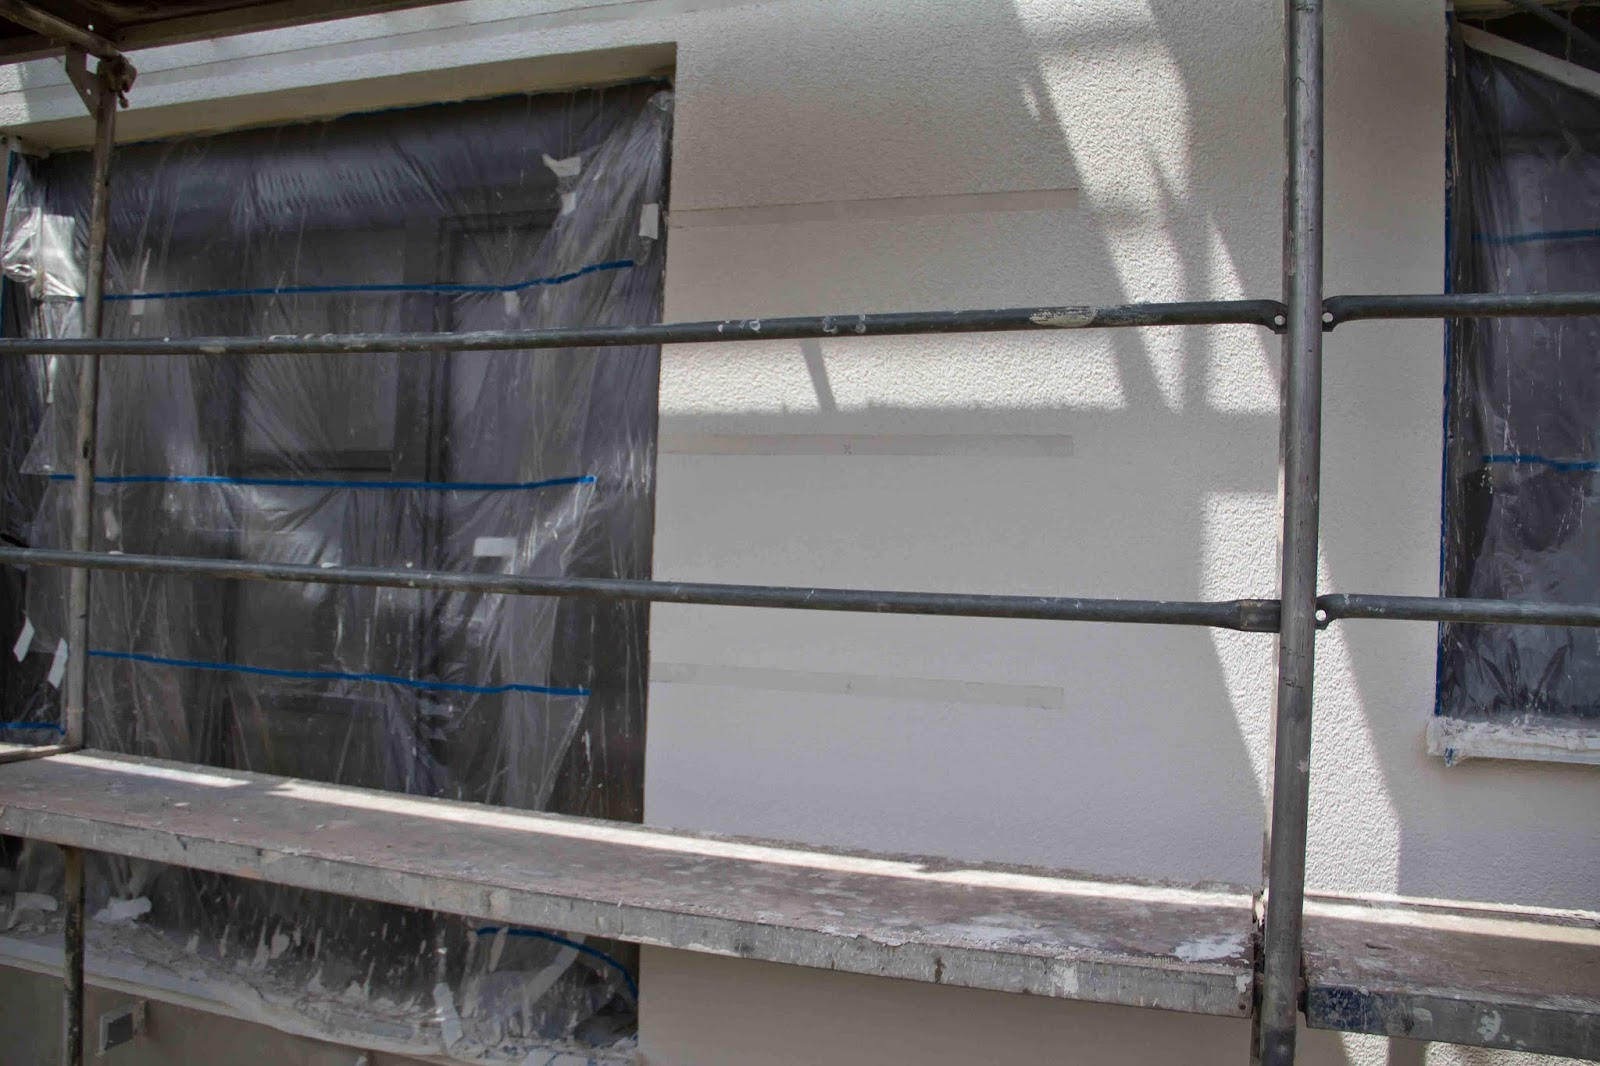 flederhaus strukturputz au en komplett fertig. Black Bedroom Furniture Sets. Home Design Ideas